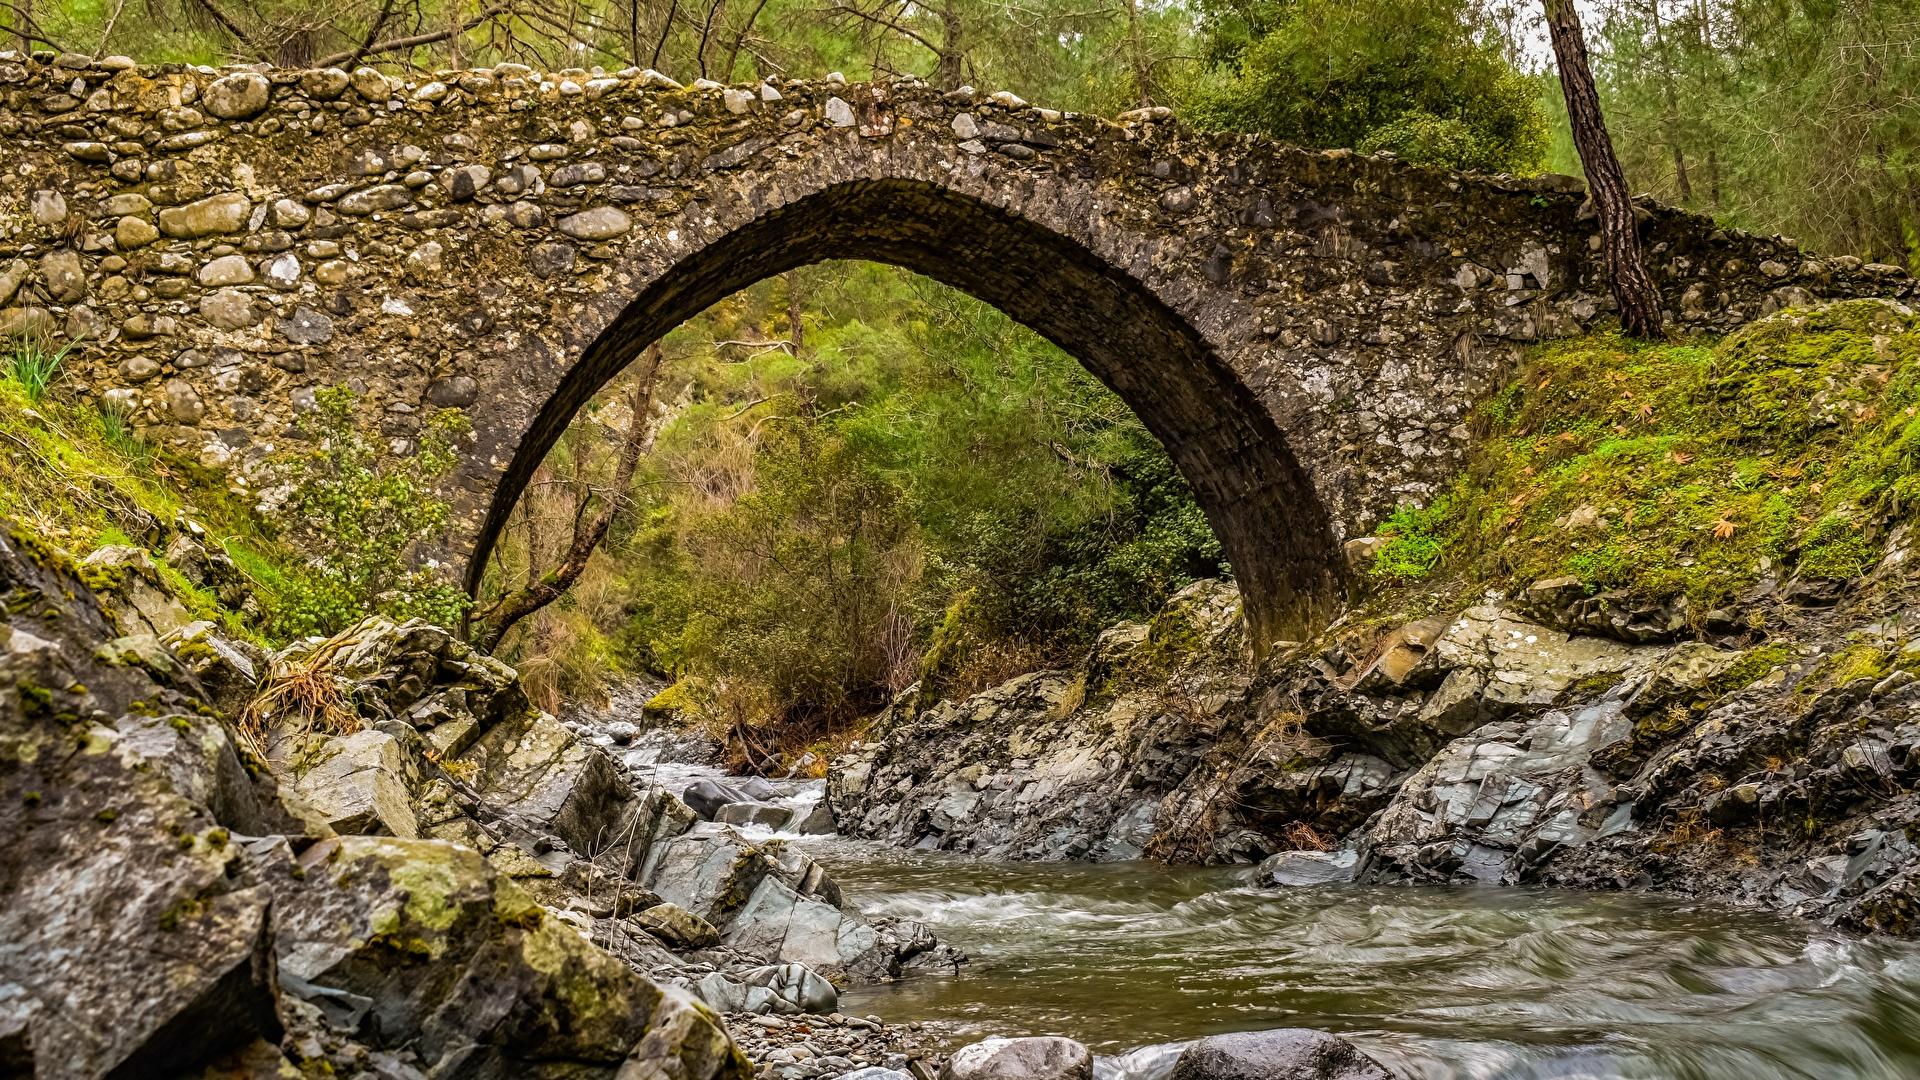 Image Arch Nature Stream Bridges Moss Stones 1920x1080 Creek brook bridge Creeks Streams stone